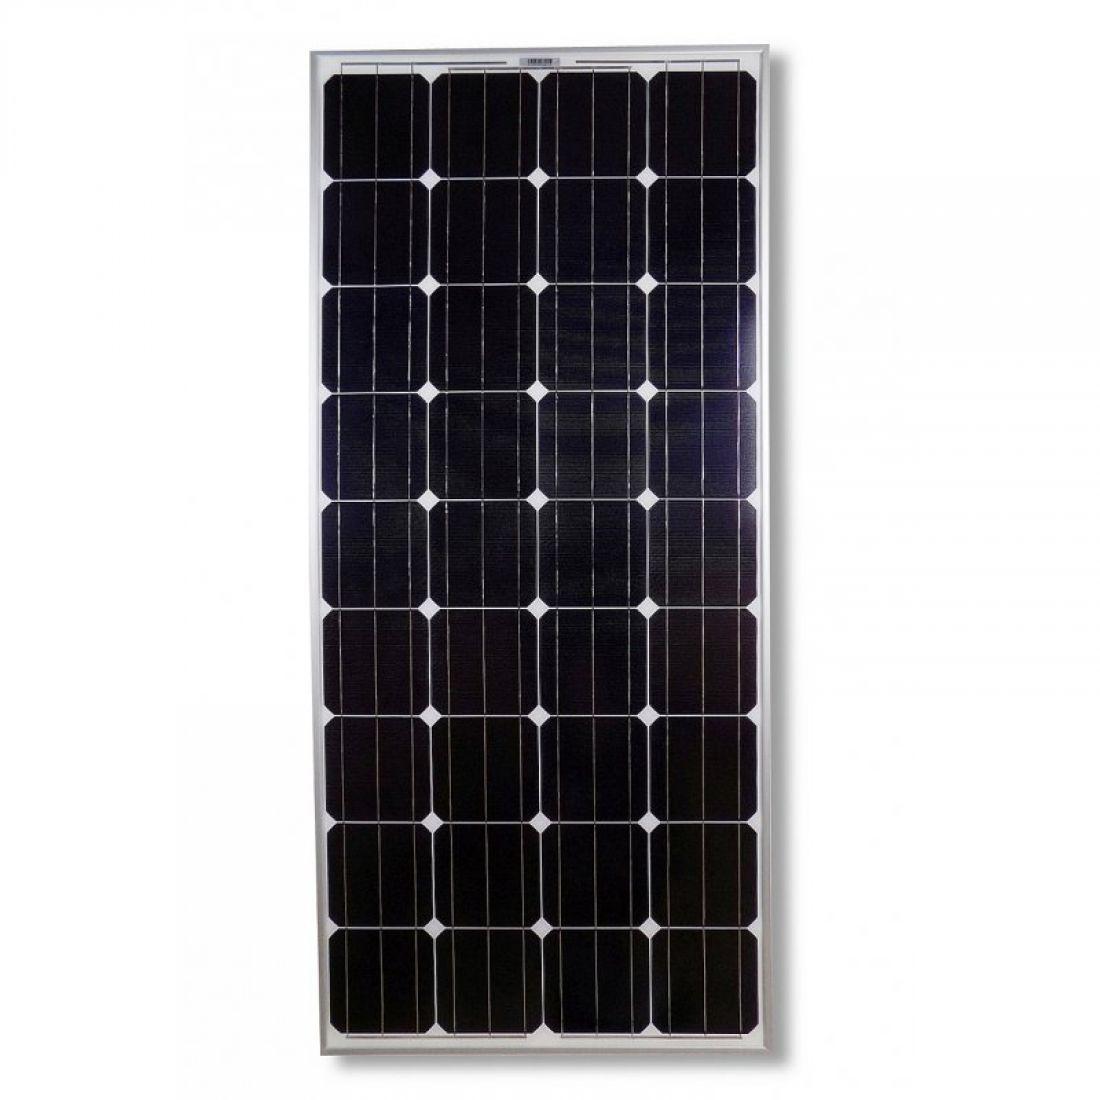 solaranlage 2 f r gartenhaus bergh tte inselanlage. Black Bedroom Furniture Sets. Home Design Ideas